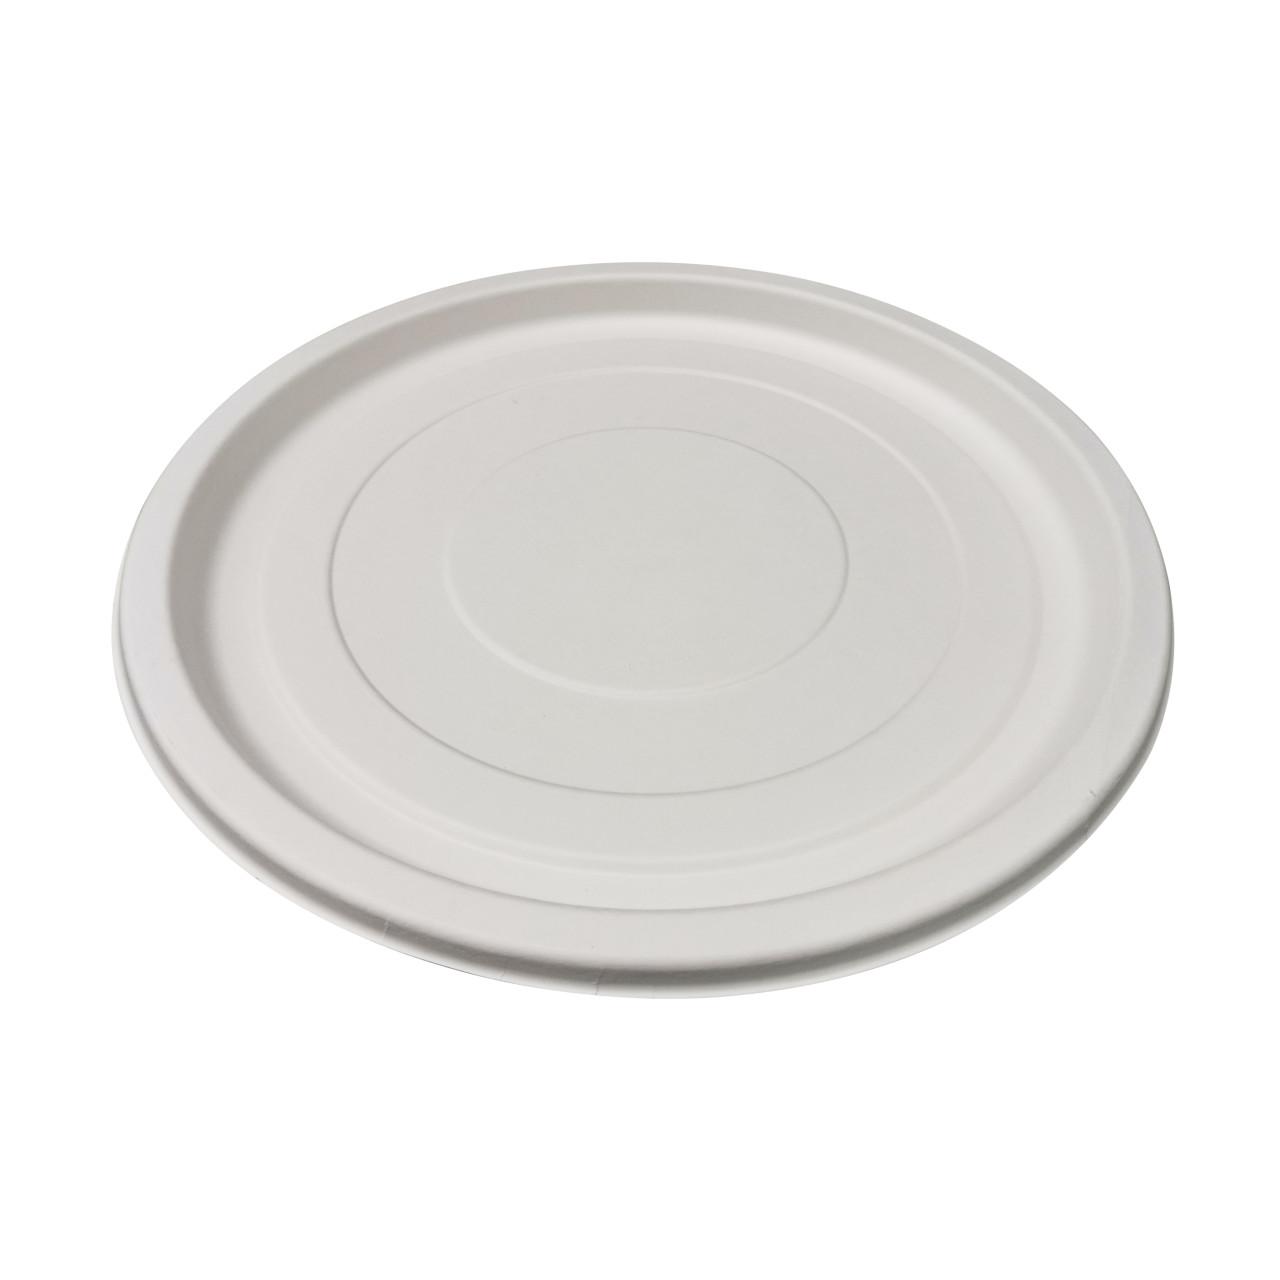 White Round Sugarcane Platter - Dia:18in H:.9in